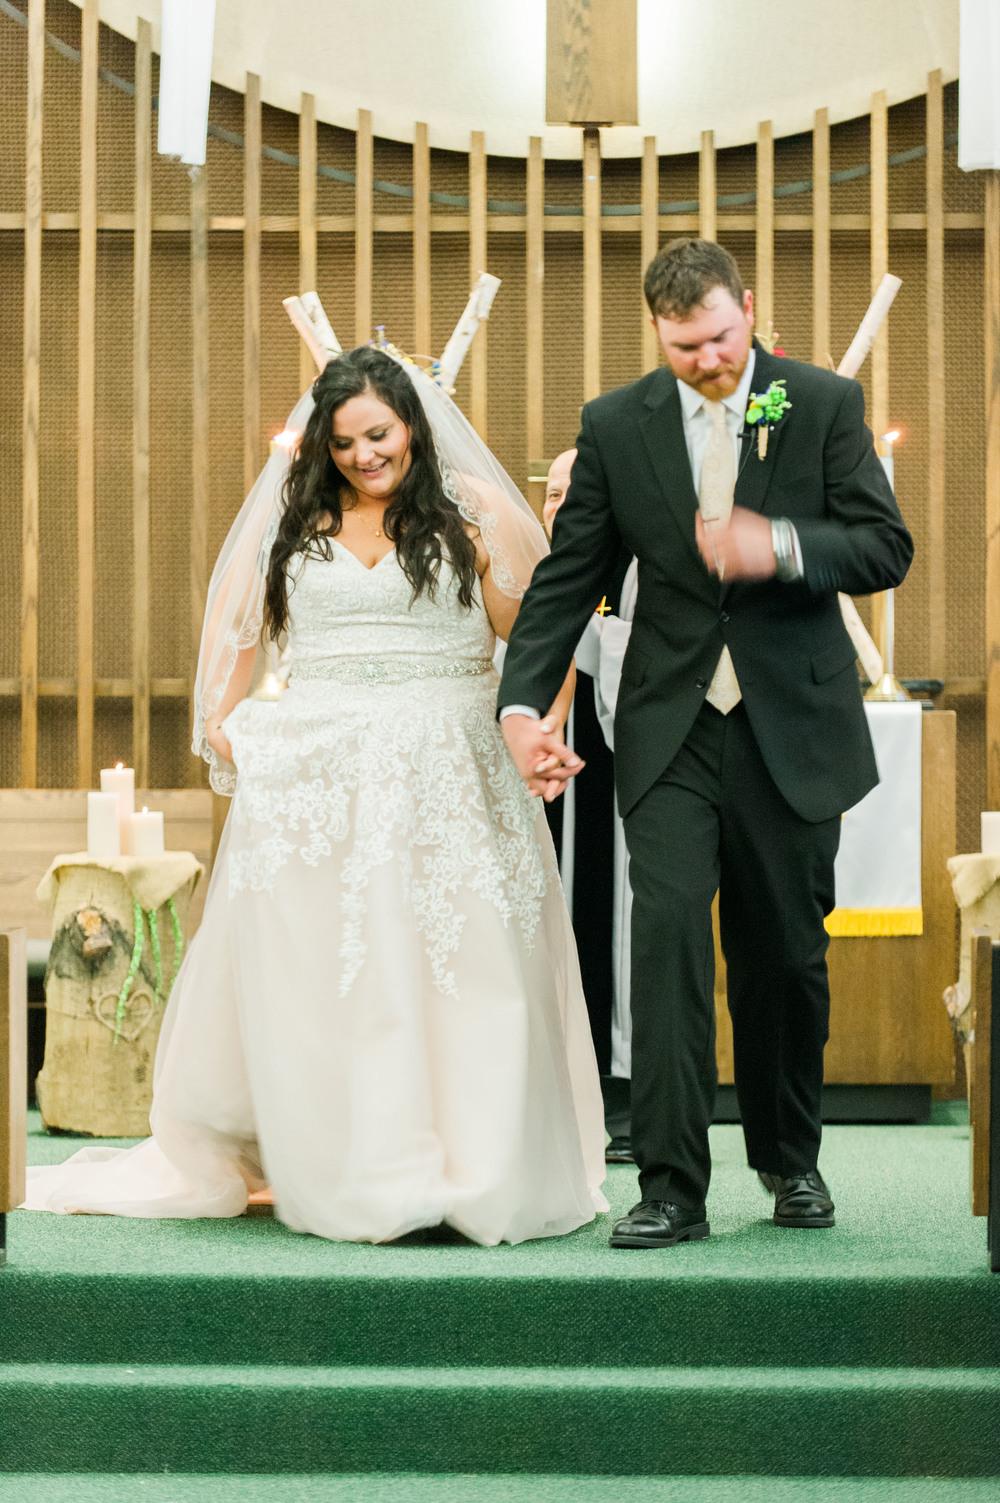 omaha-wedding-vendor-samantha-weddings--13.jpg